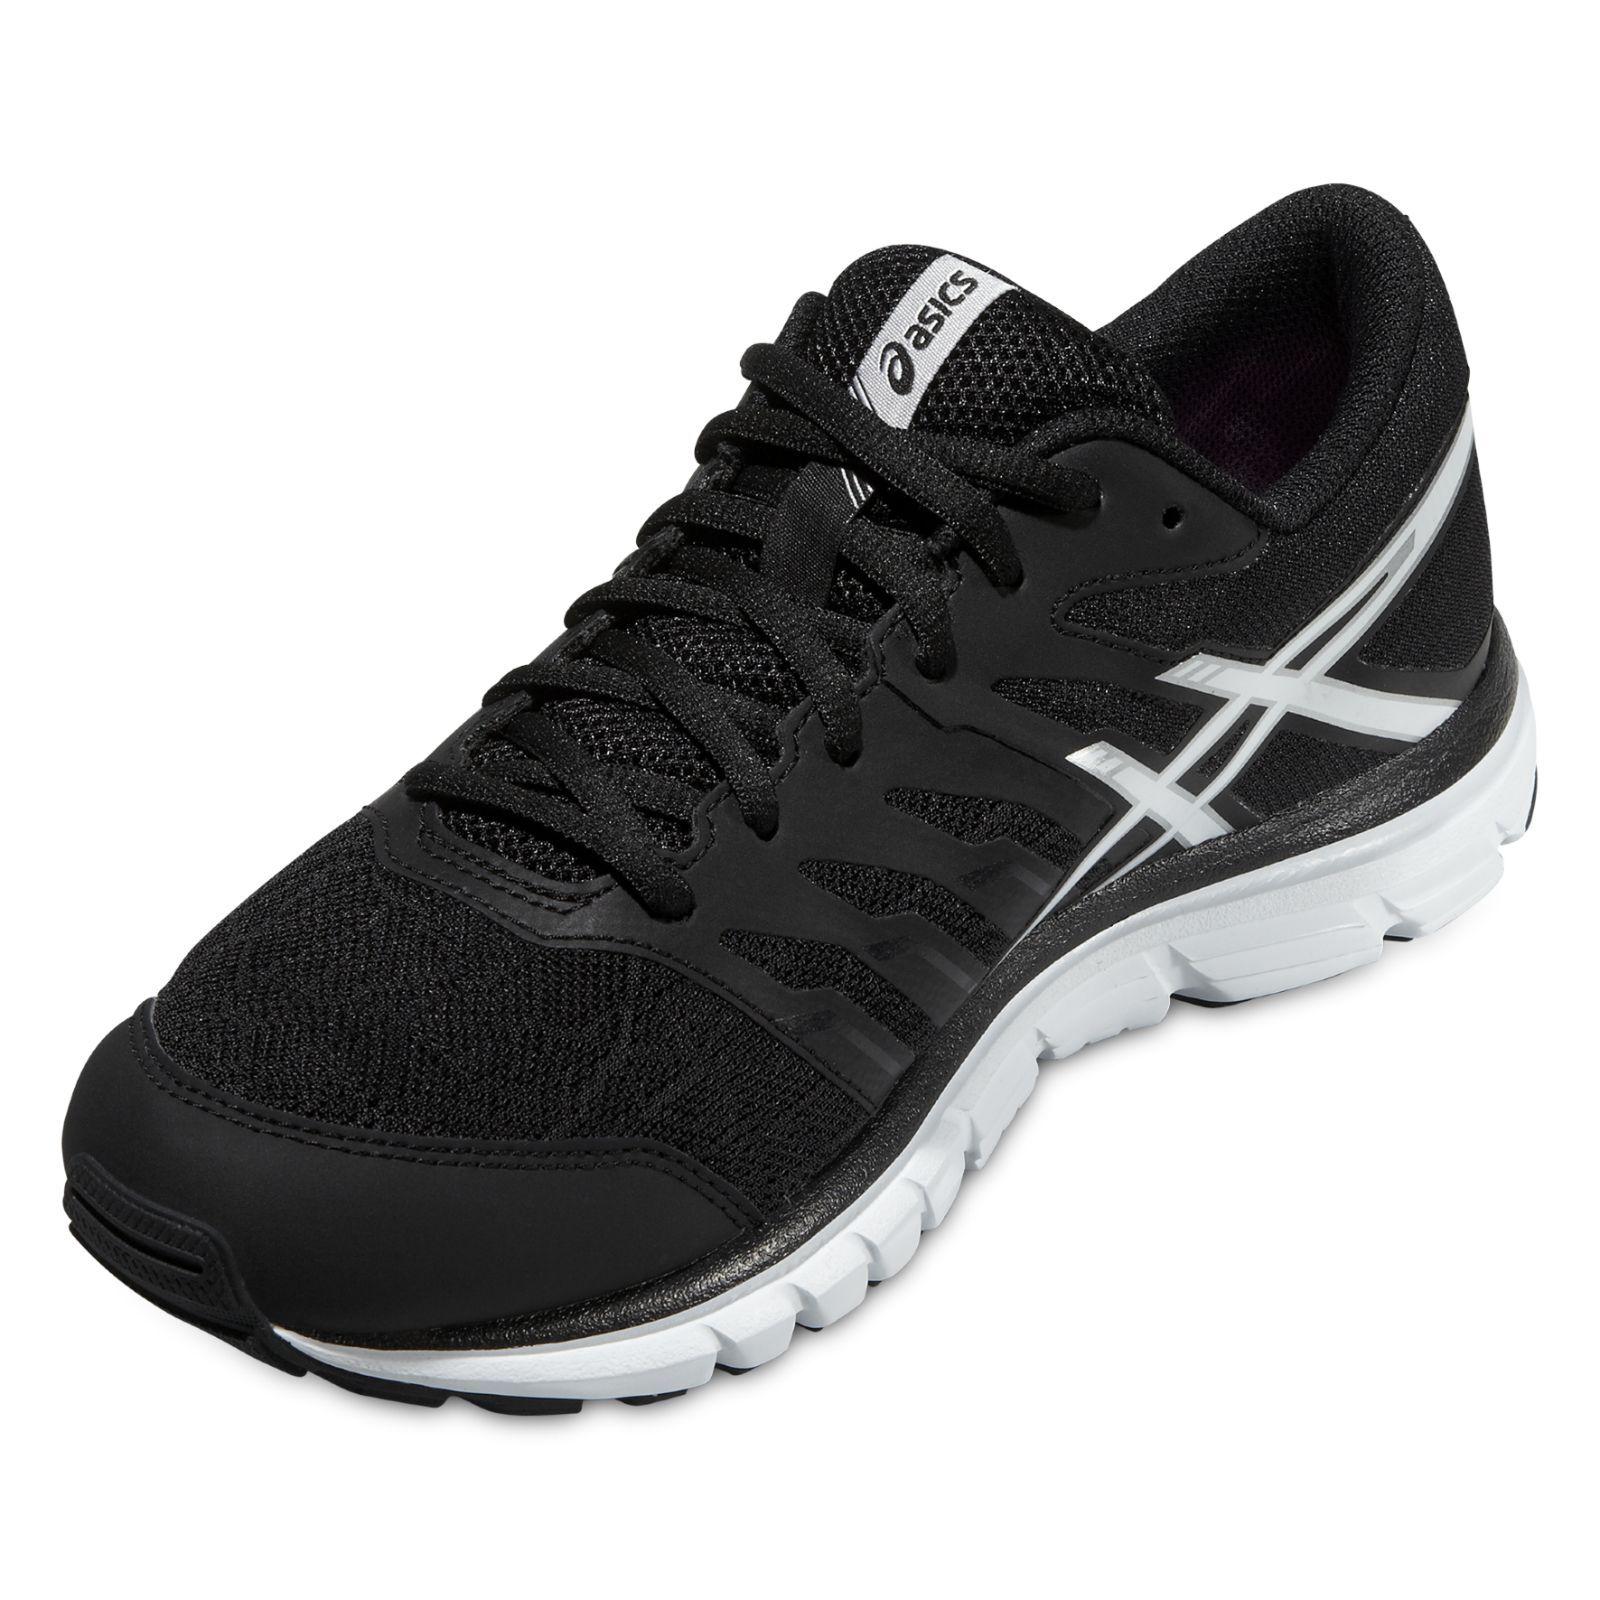 Asics Asics Asics GEL-Zaraca 4 - Damen-Laufschuhe - Größe 37,5 - Jogging - Running - T5K8N cbf78c